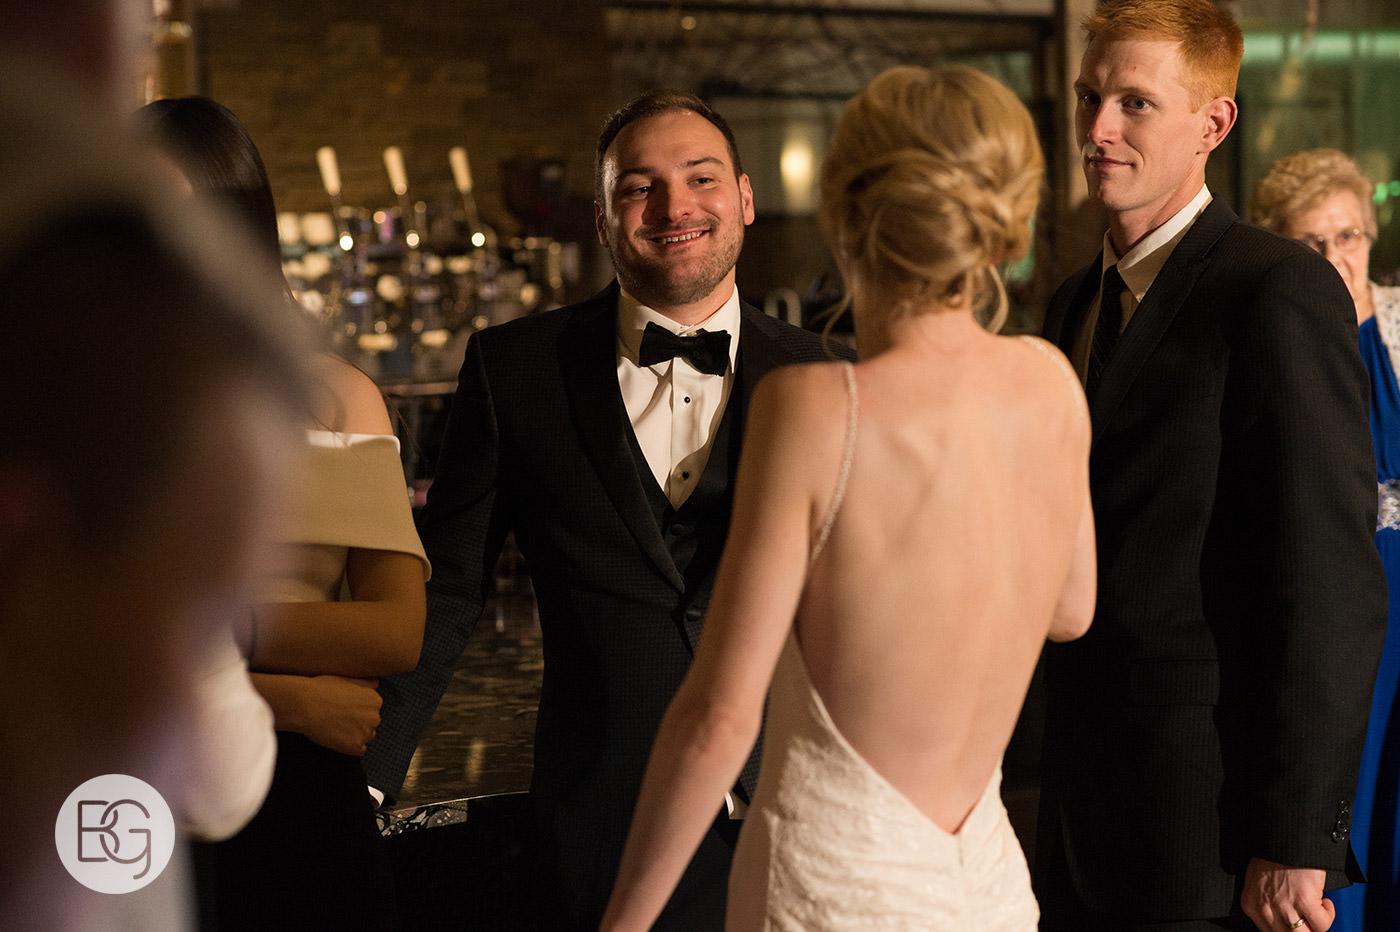 Edmonton_wedding_photographers_josh_sara_whyte_42.jpg